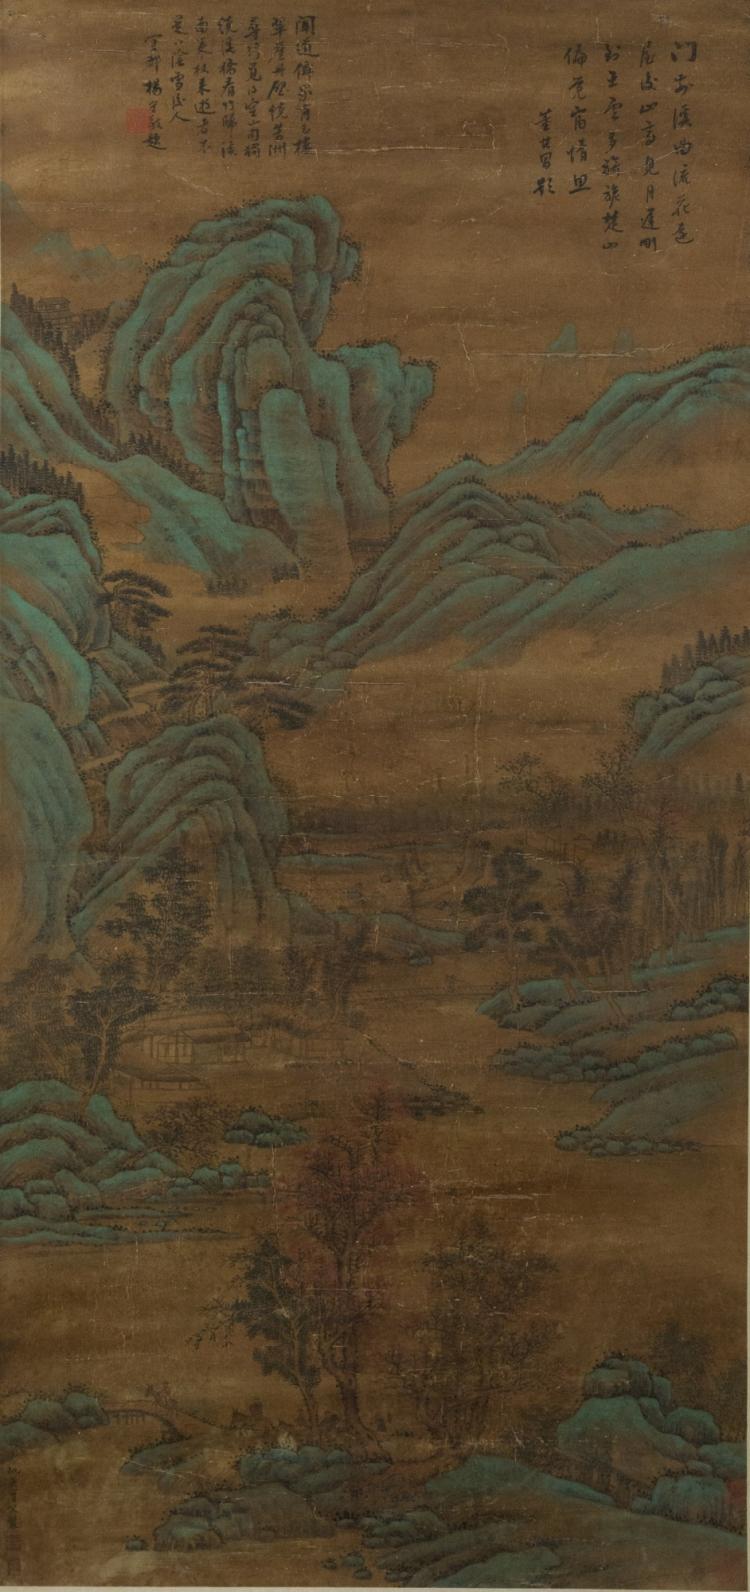 Chinese Landscape Painting Signed Chou Ying